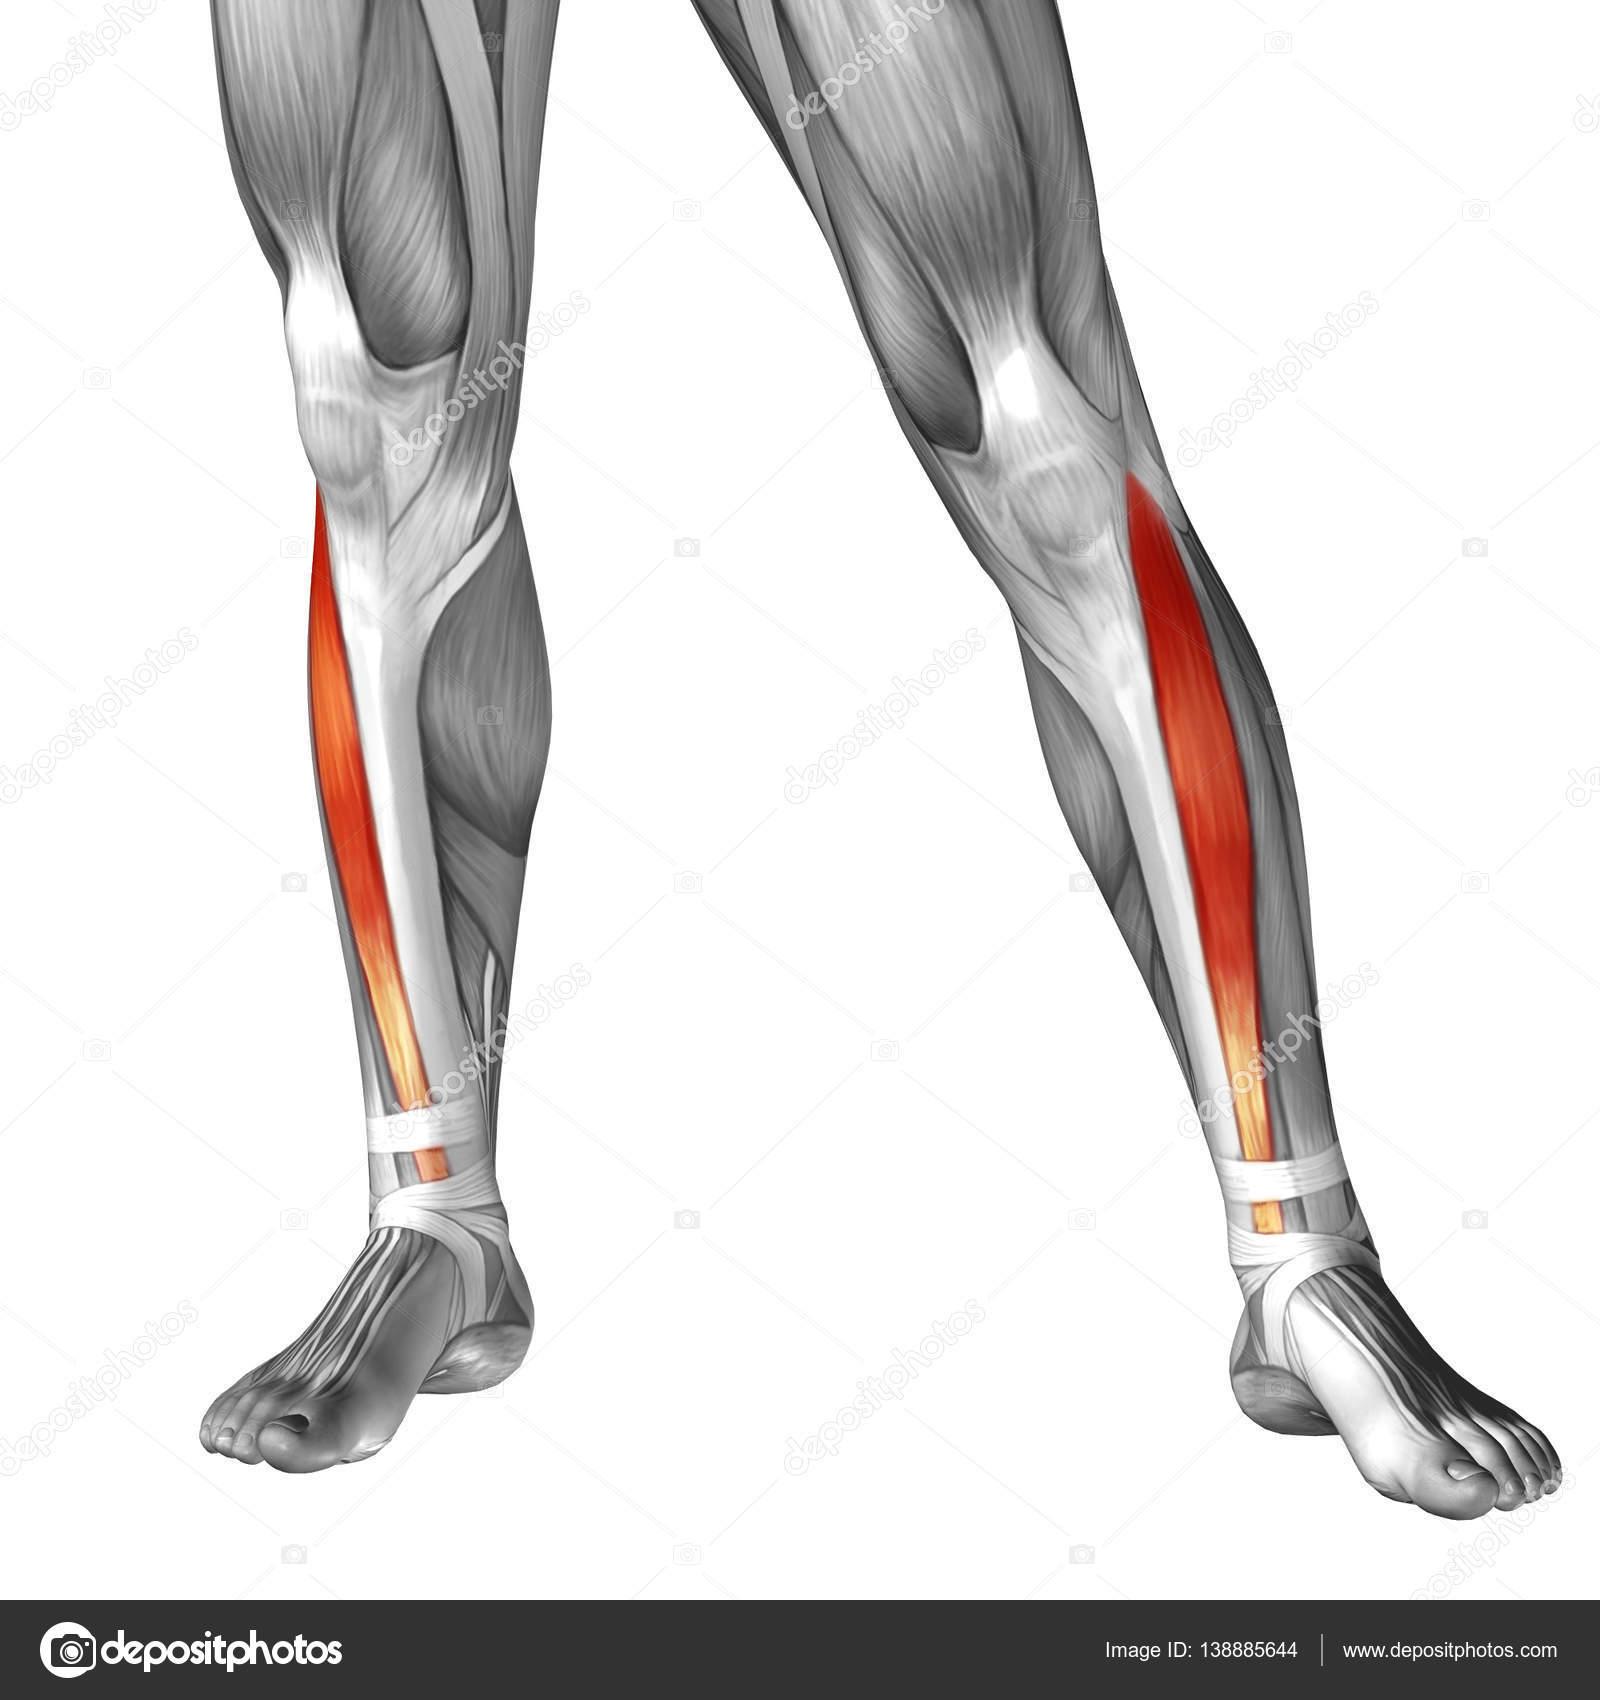 Human Lower Leg Anatomy Stock Photo Design36 138885644